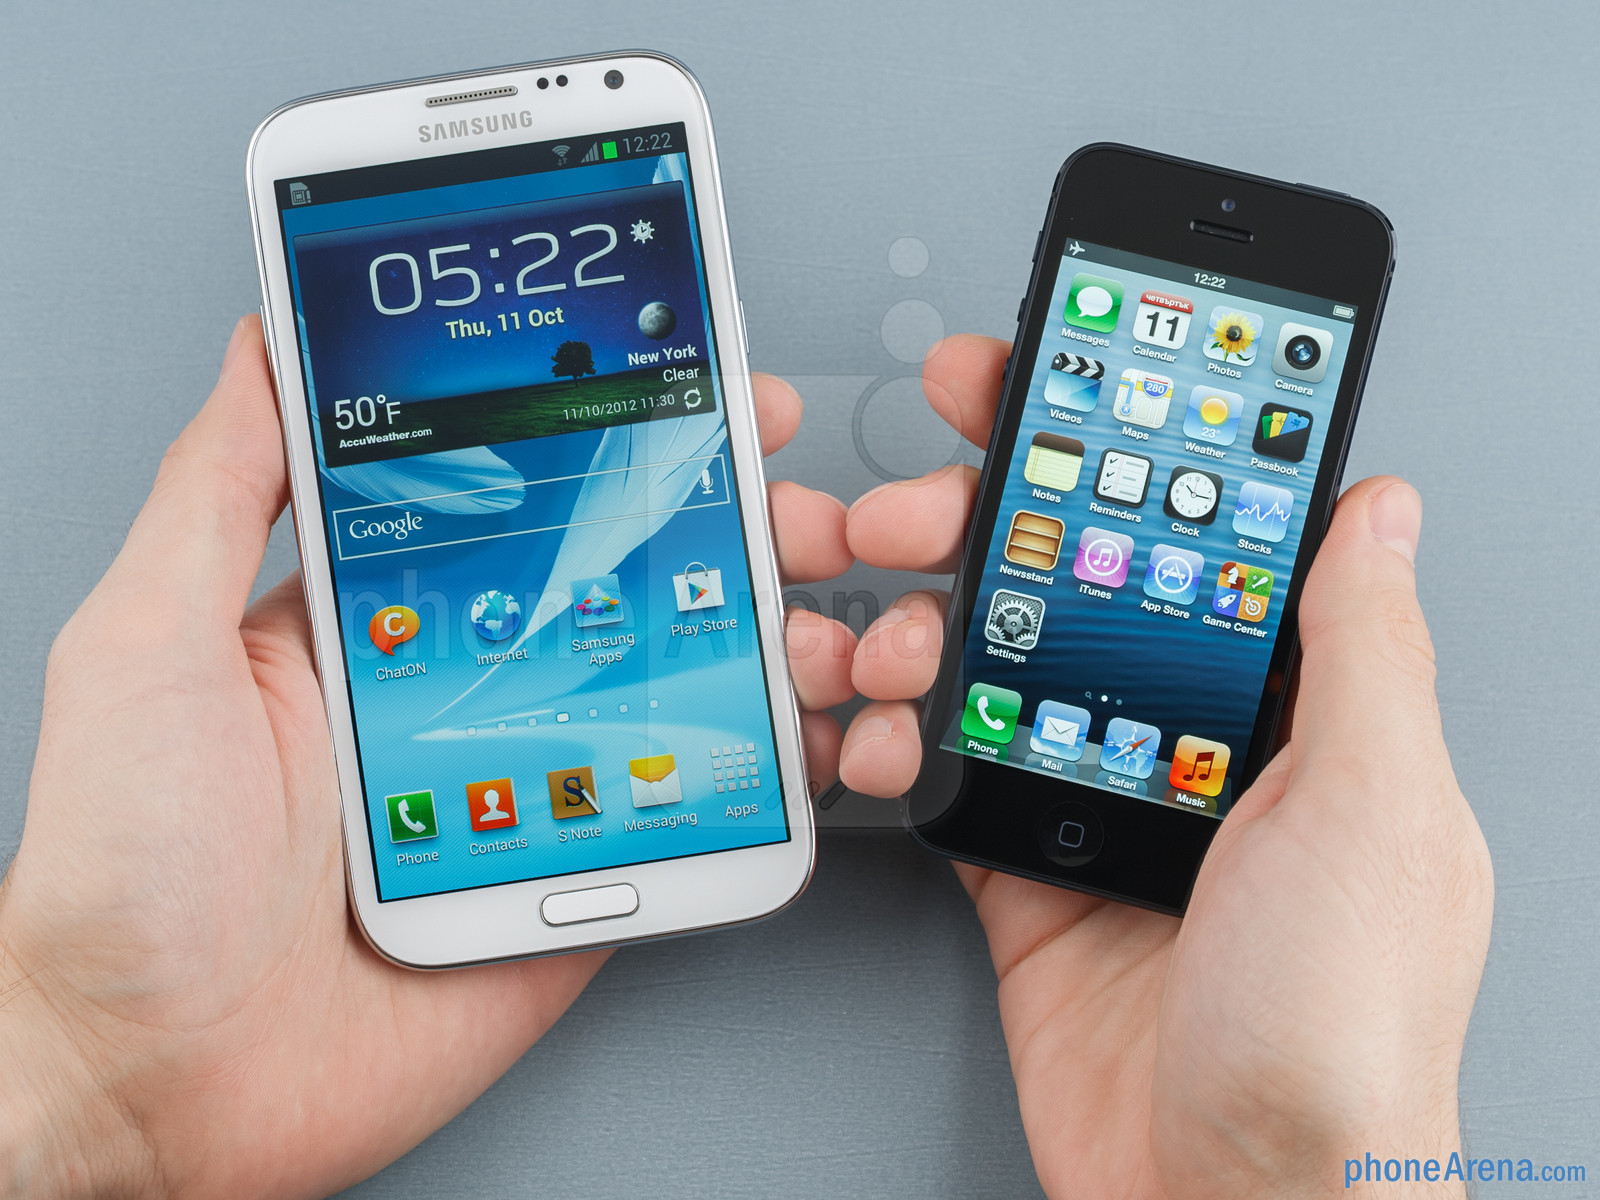 Samsung-Galaxy-Note-II-vs-iPhone-5-56